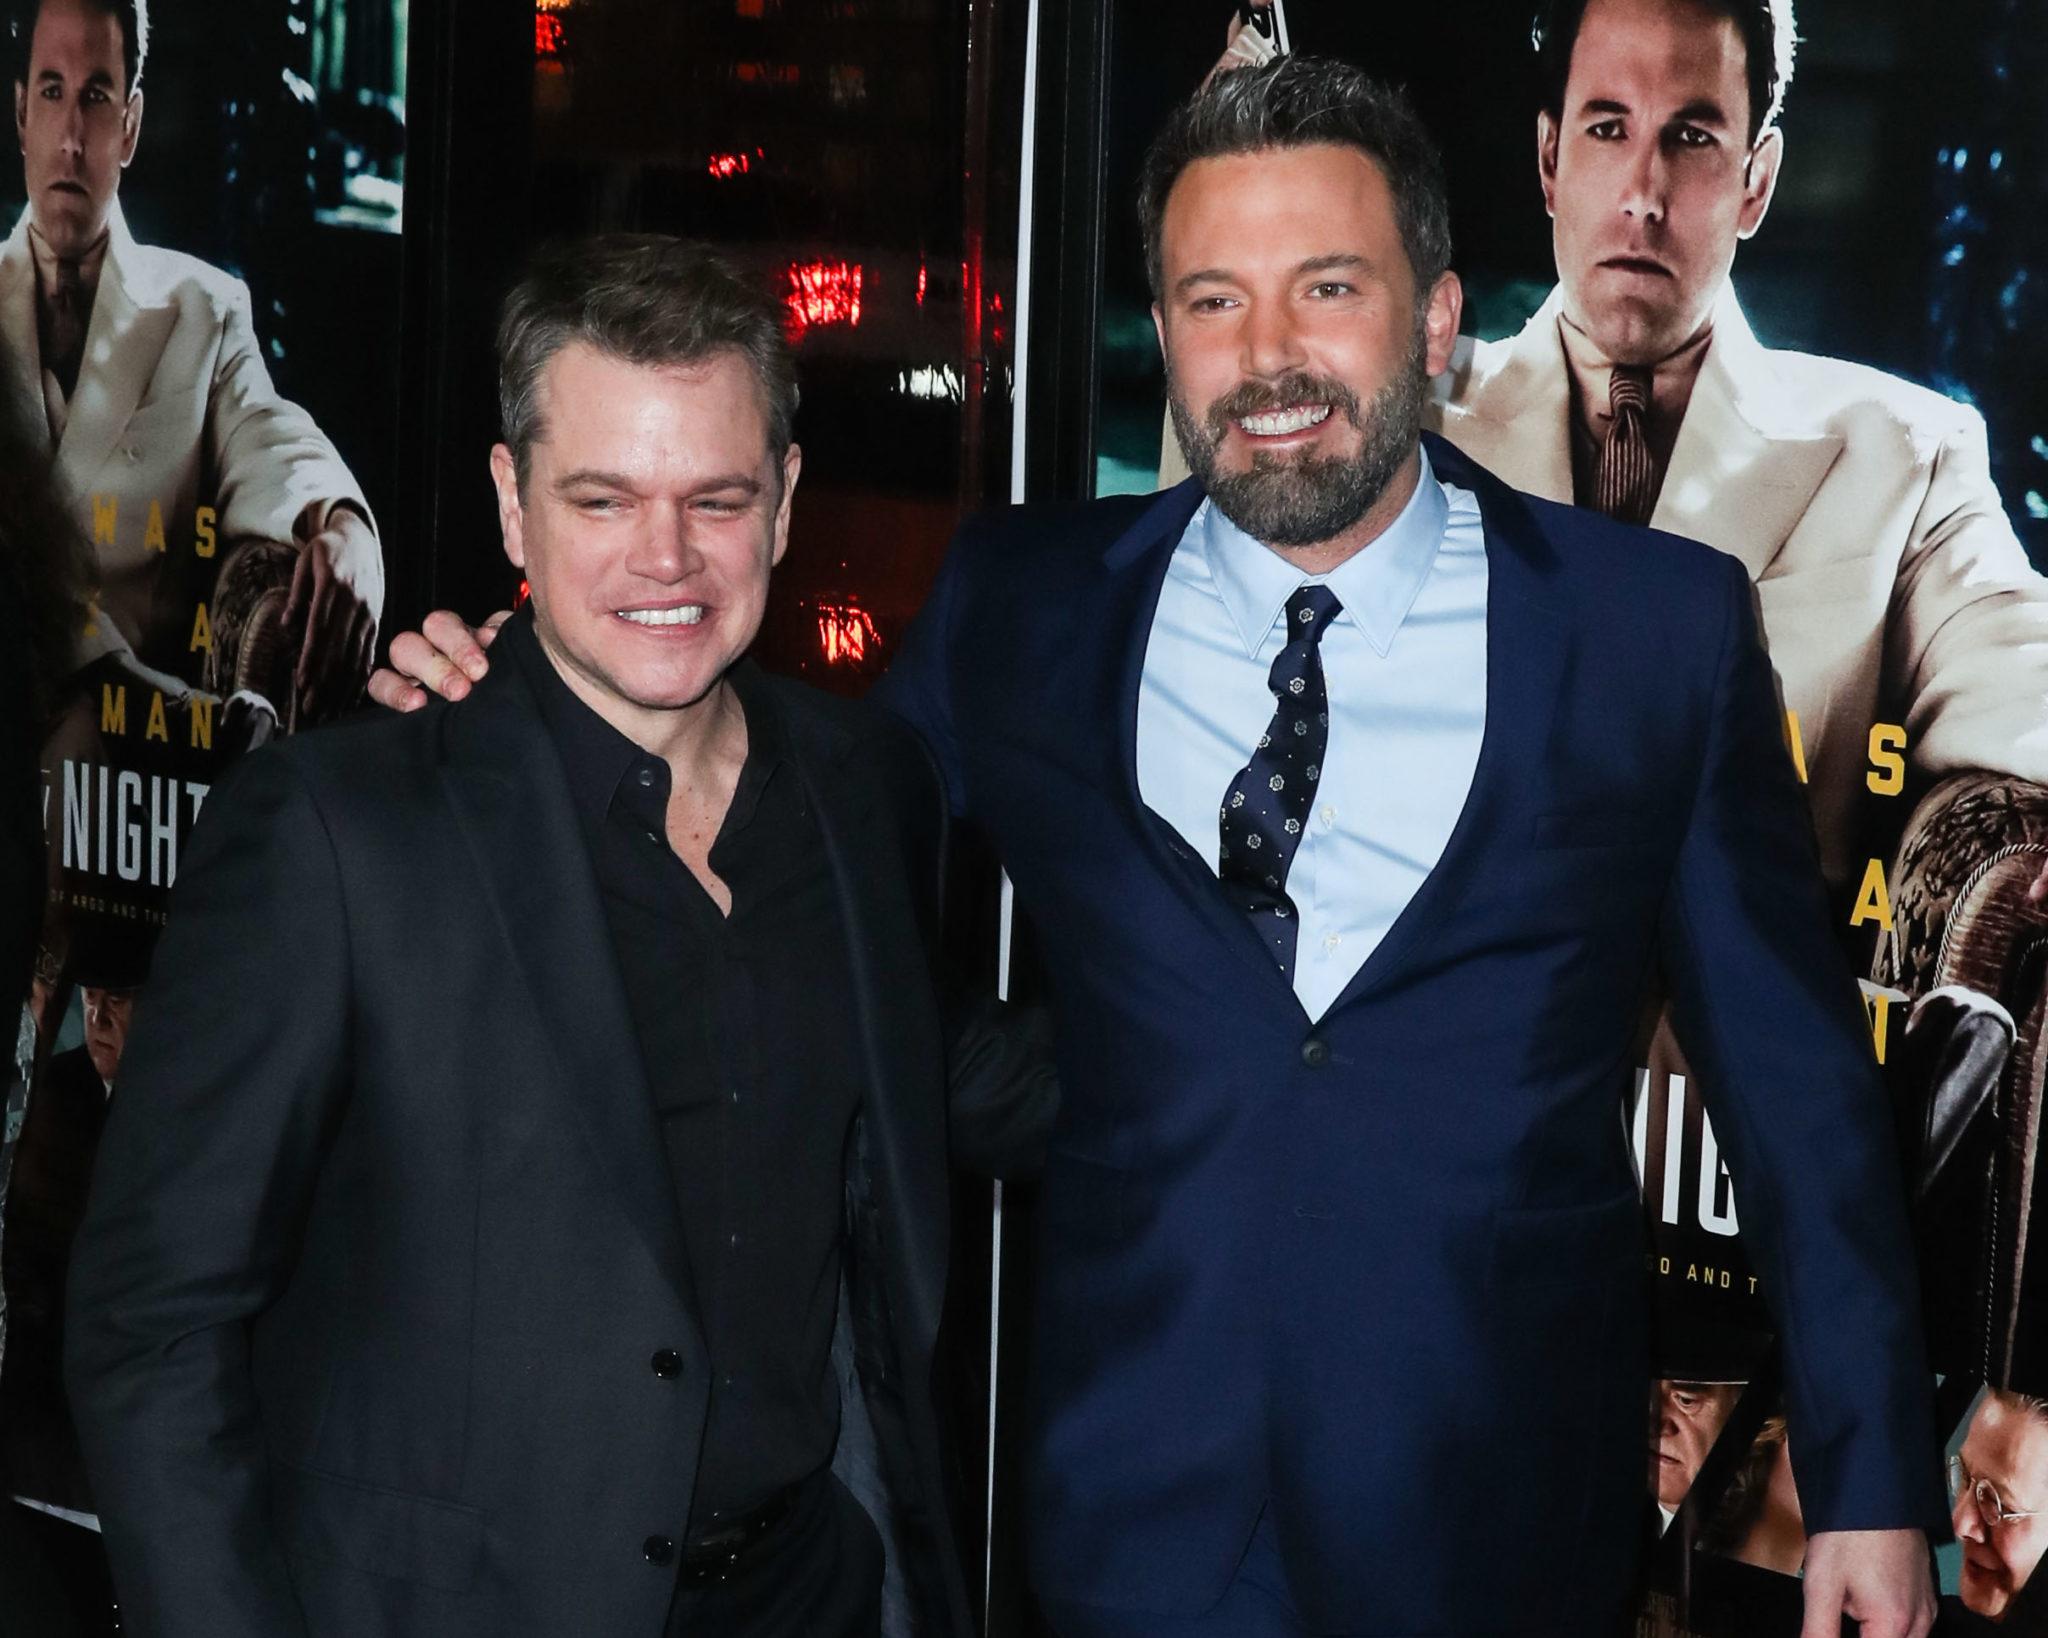 att Damon and Ben Affleck